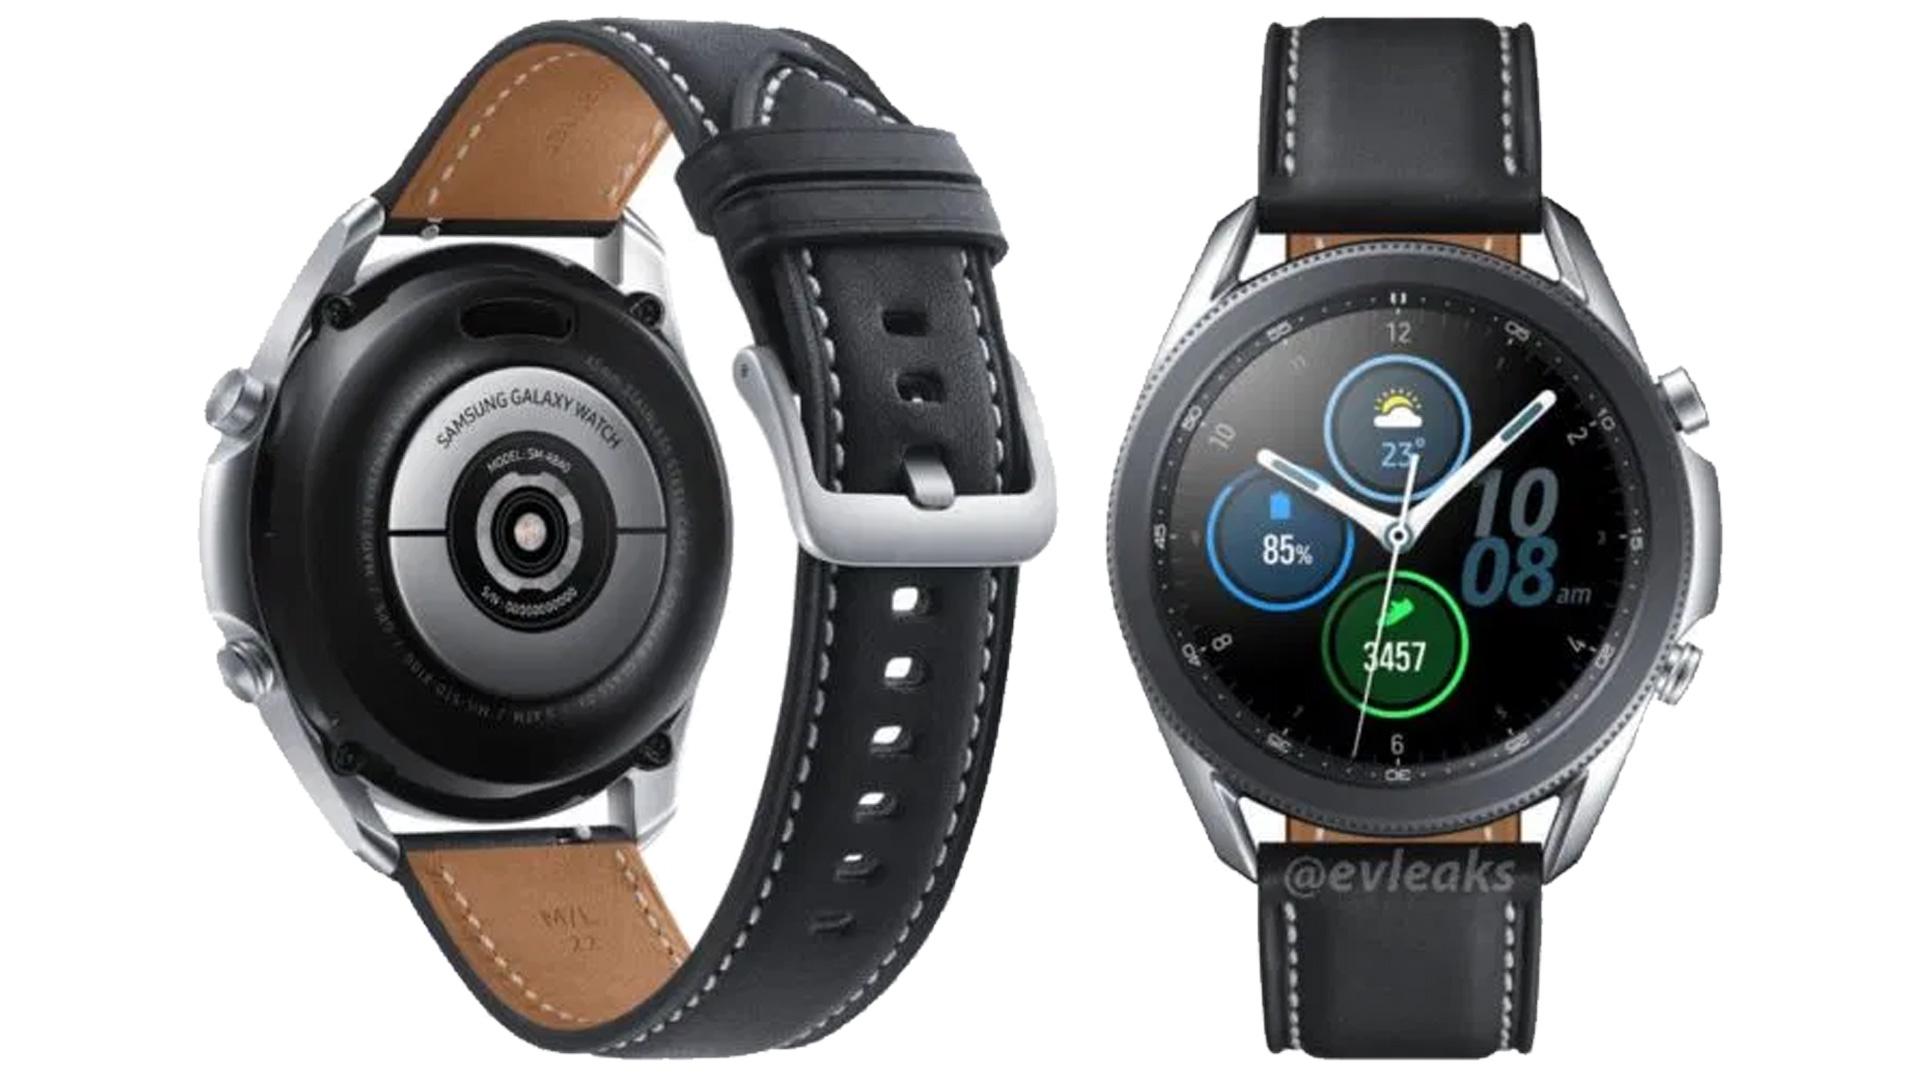 Samsung Galaxy Watch 3 senza segreti grazie al leak del firm